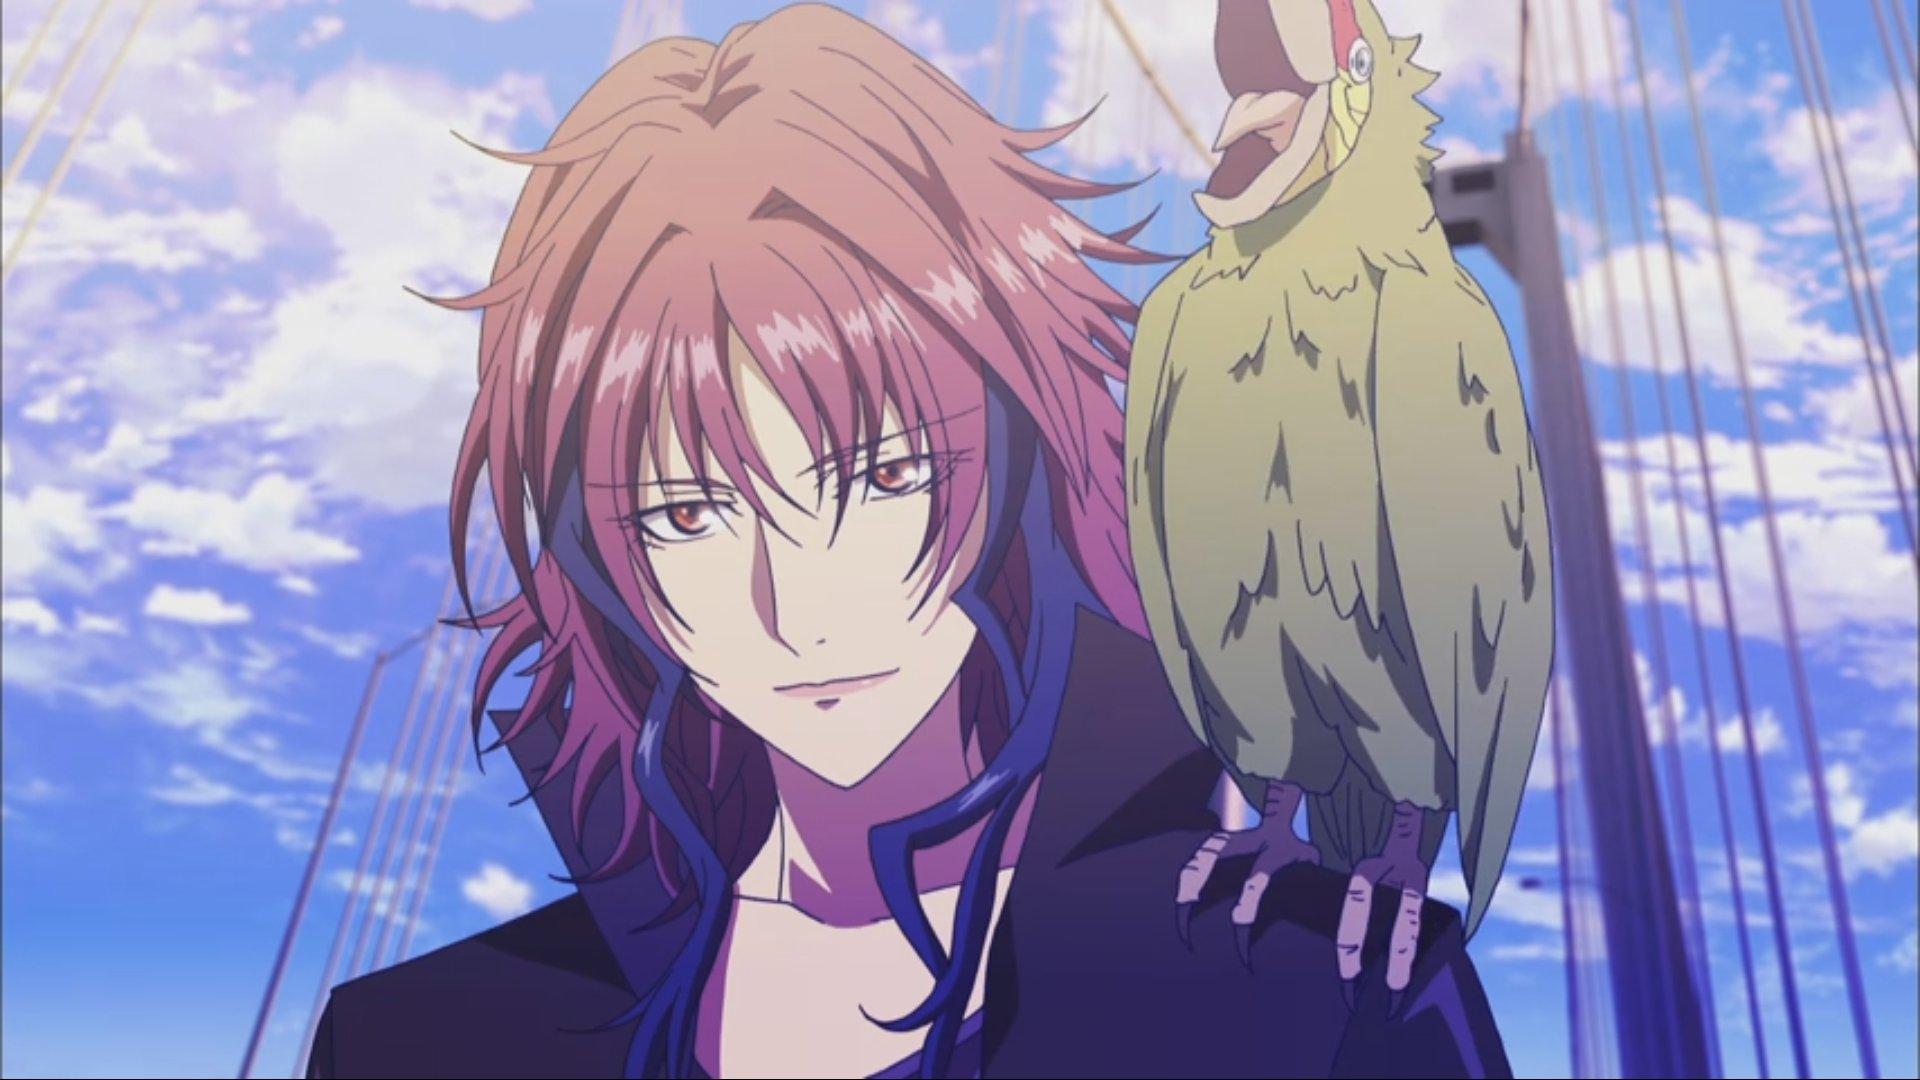 K anime return of kings episode 4 : Great india place noida